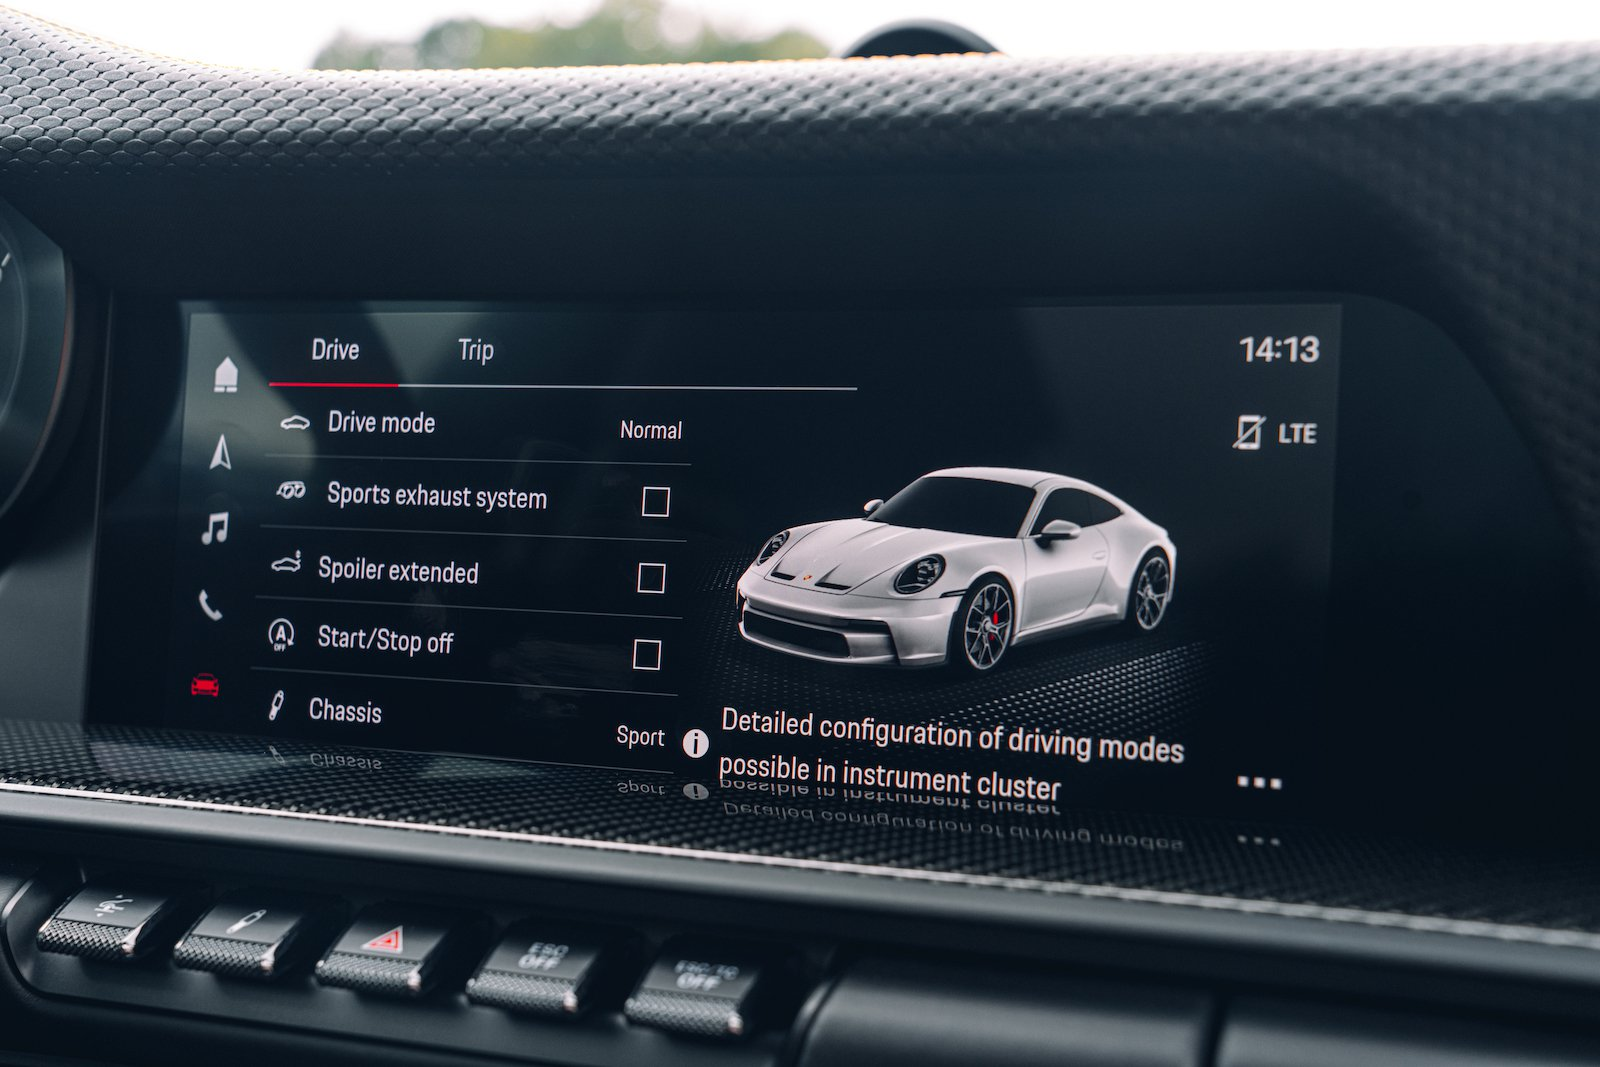 Porsche 911 GT3 Touring 2021 interior infotainment